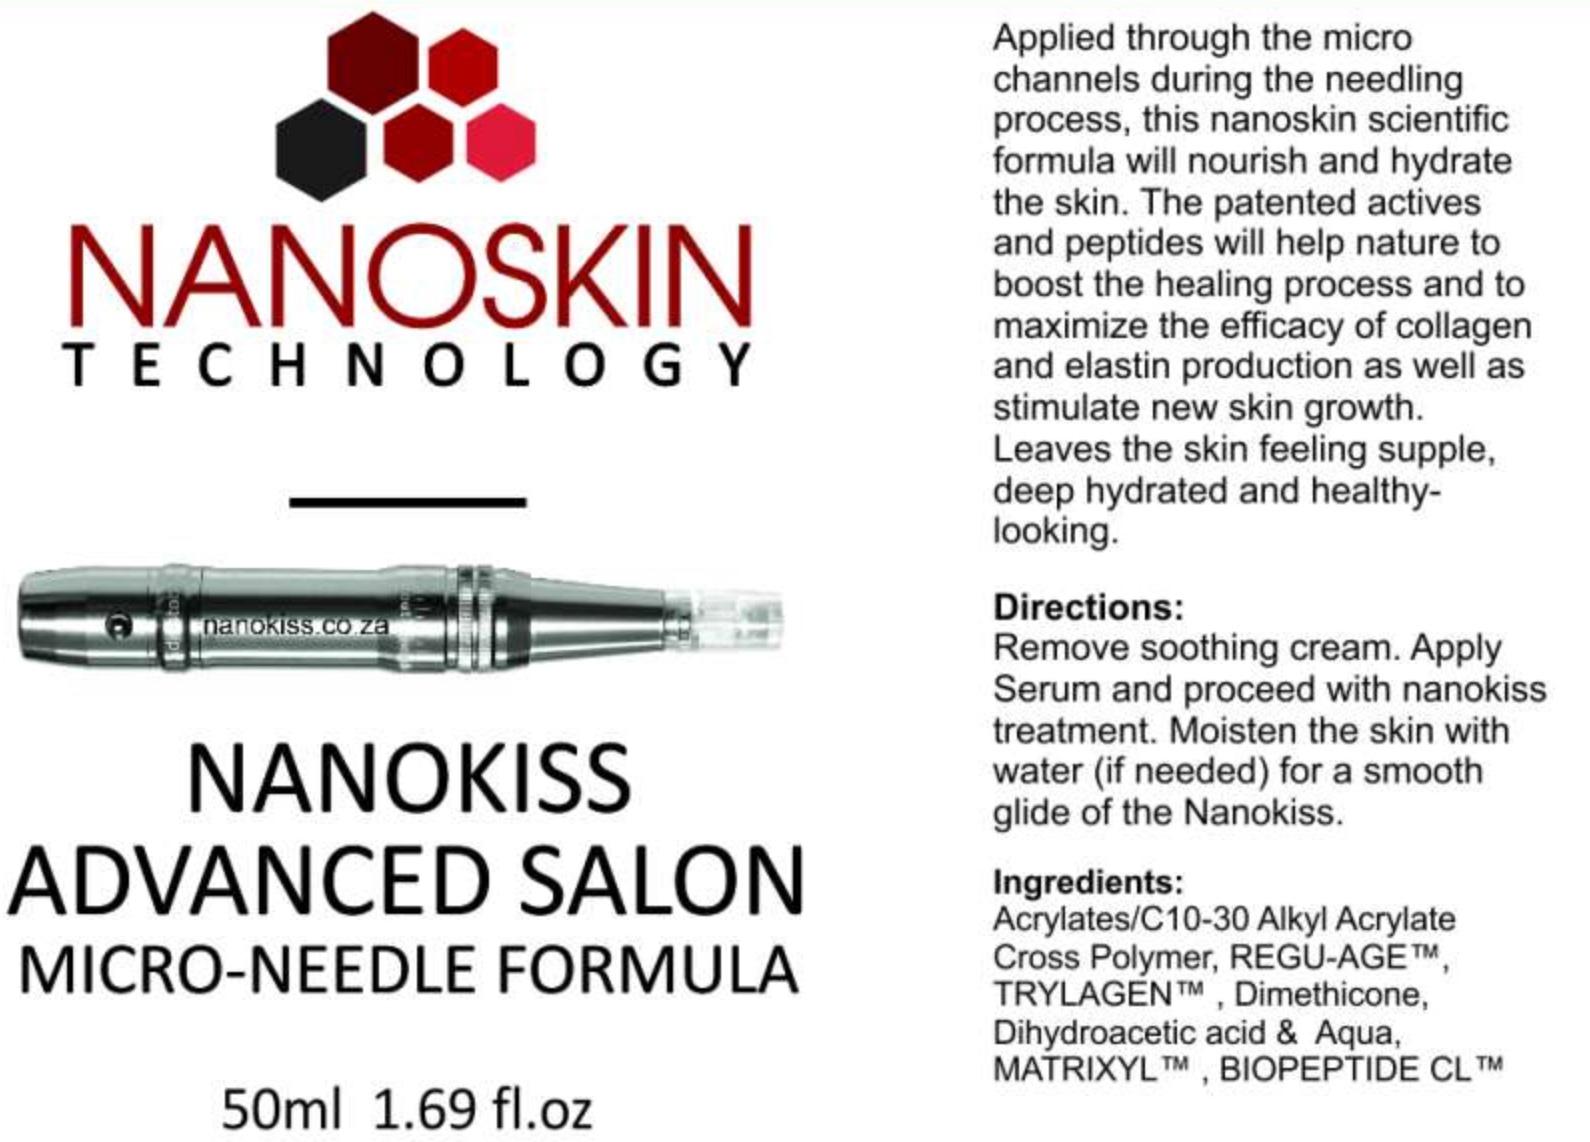 Nanoskin microneedling formula